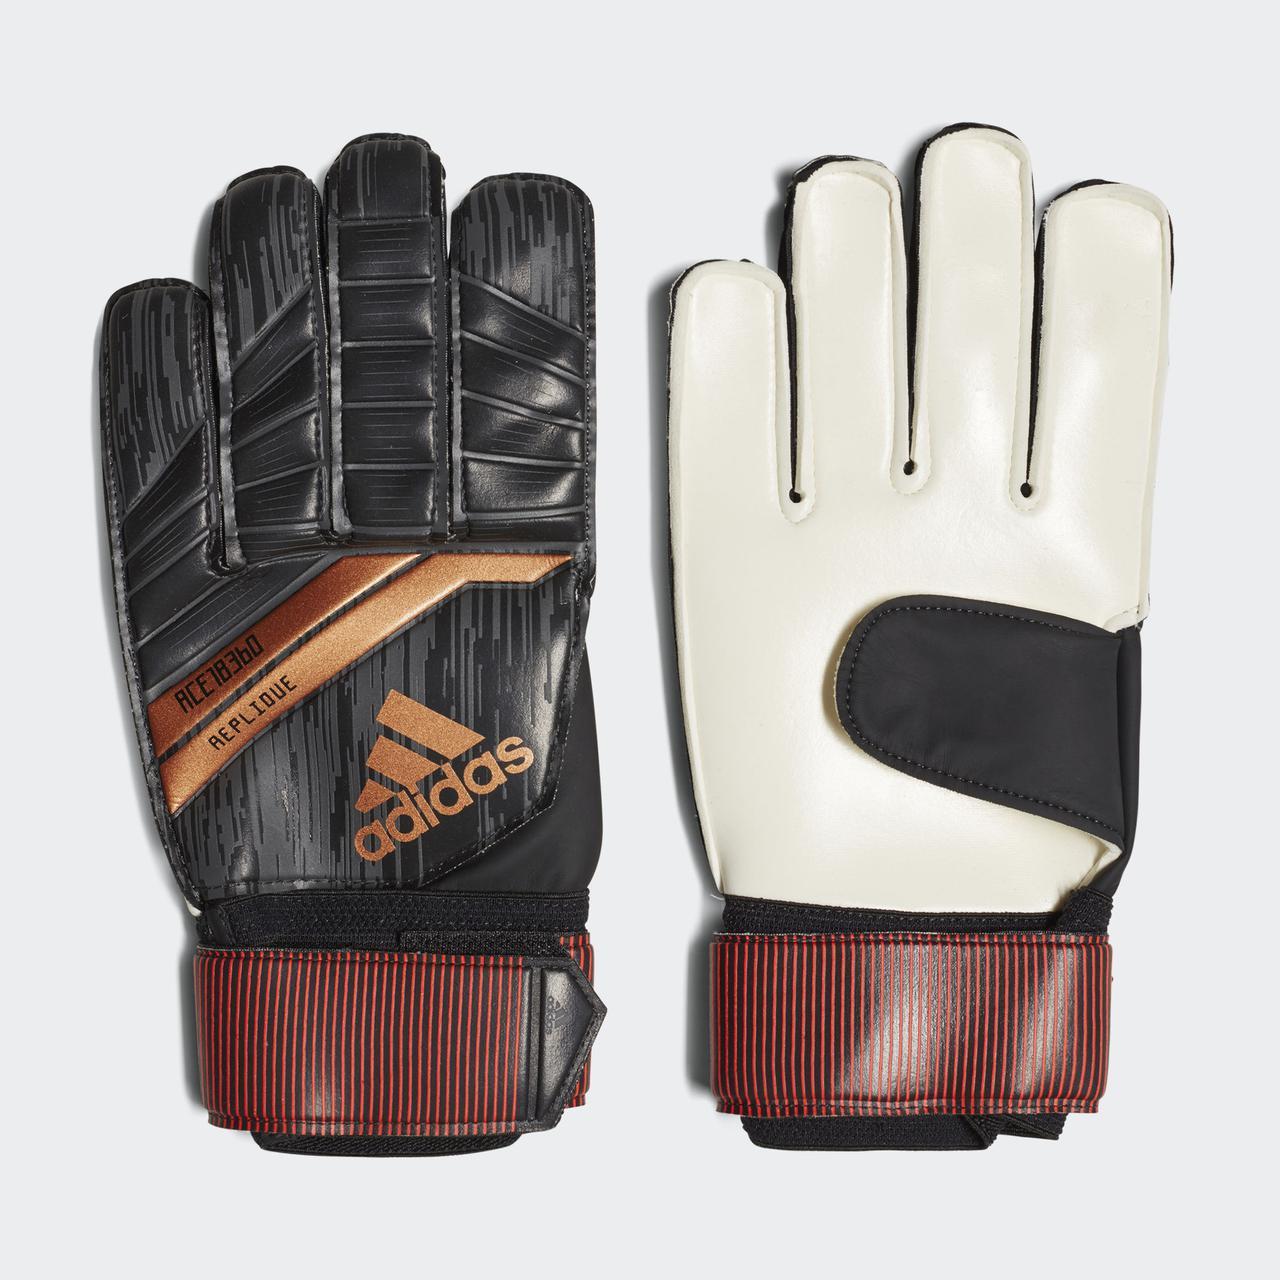 Вратарские перчатки Adidas Performance Predator 18 (Артикул: CF1363)